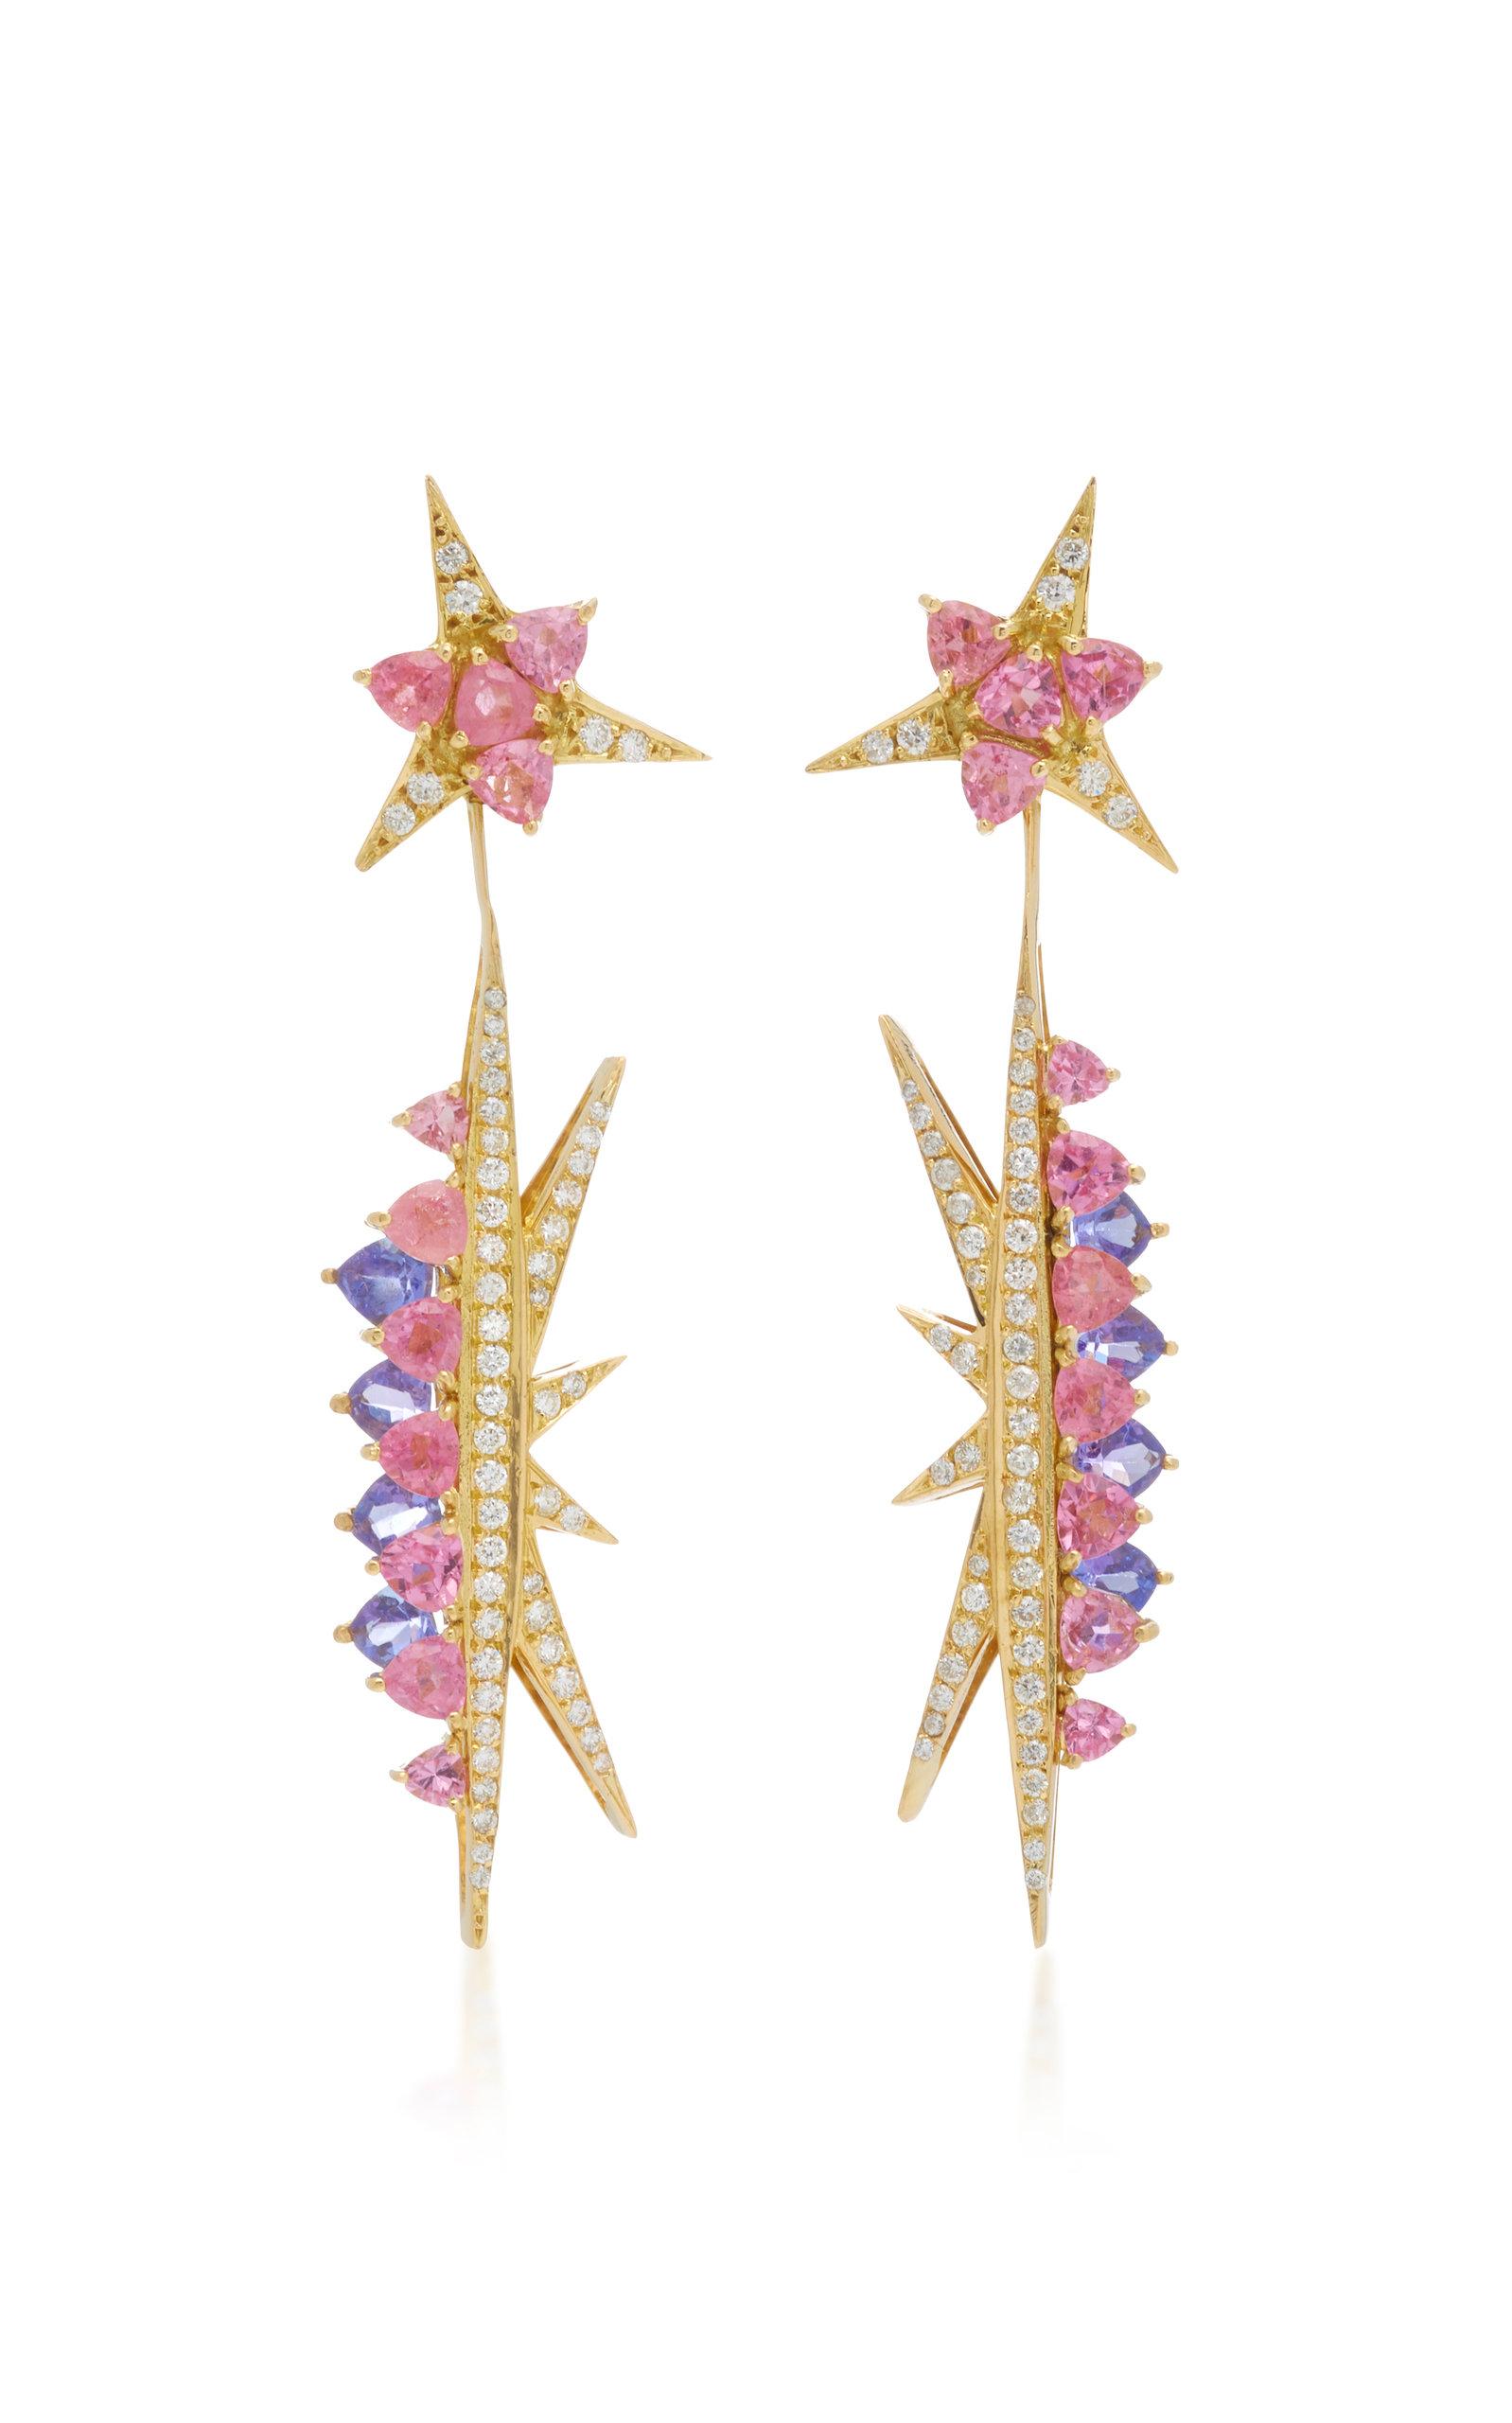 6d57b9b91 Carol KauffmannGalactic Electra 18K Gold, Pink Tourmaline, Tanzanite And Diamond  Drop Earrings